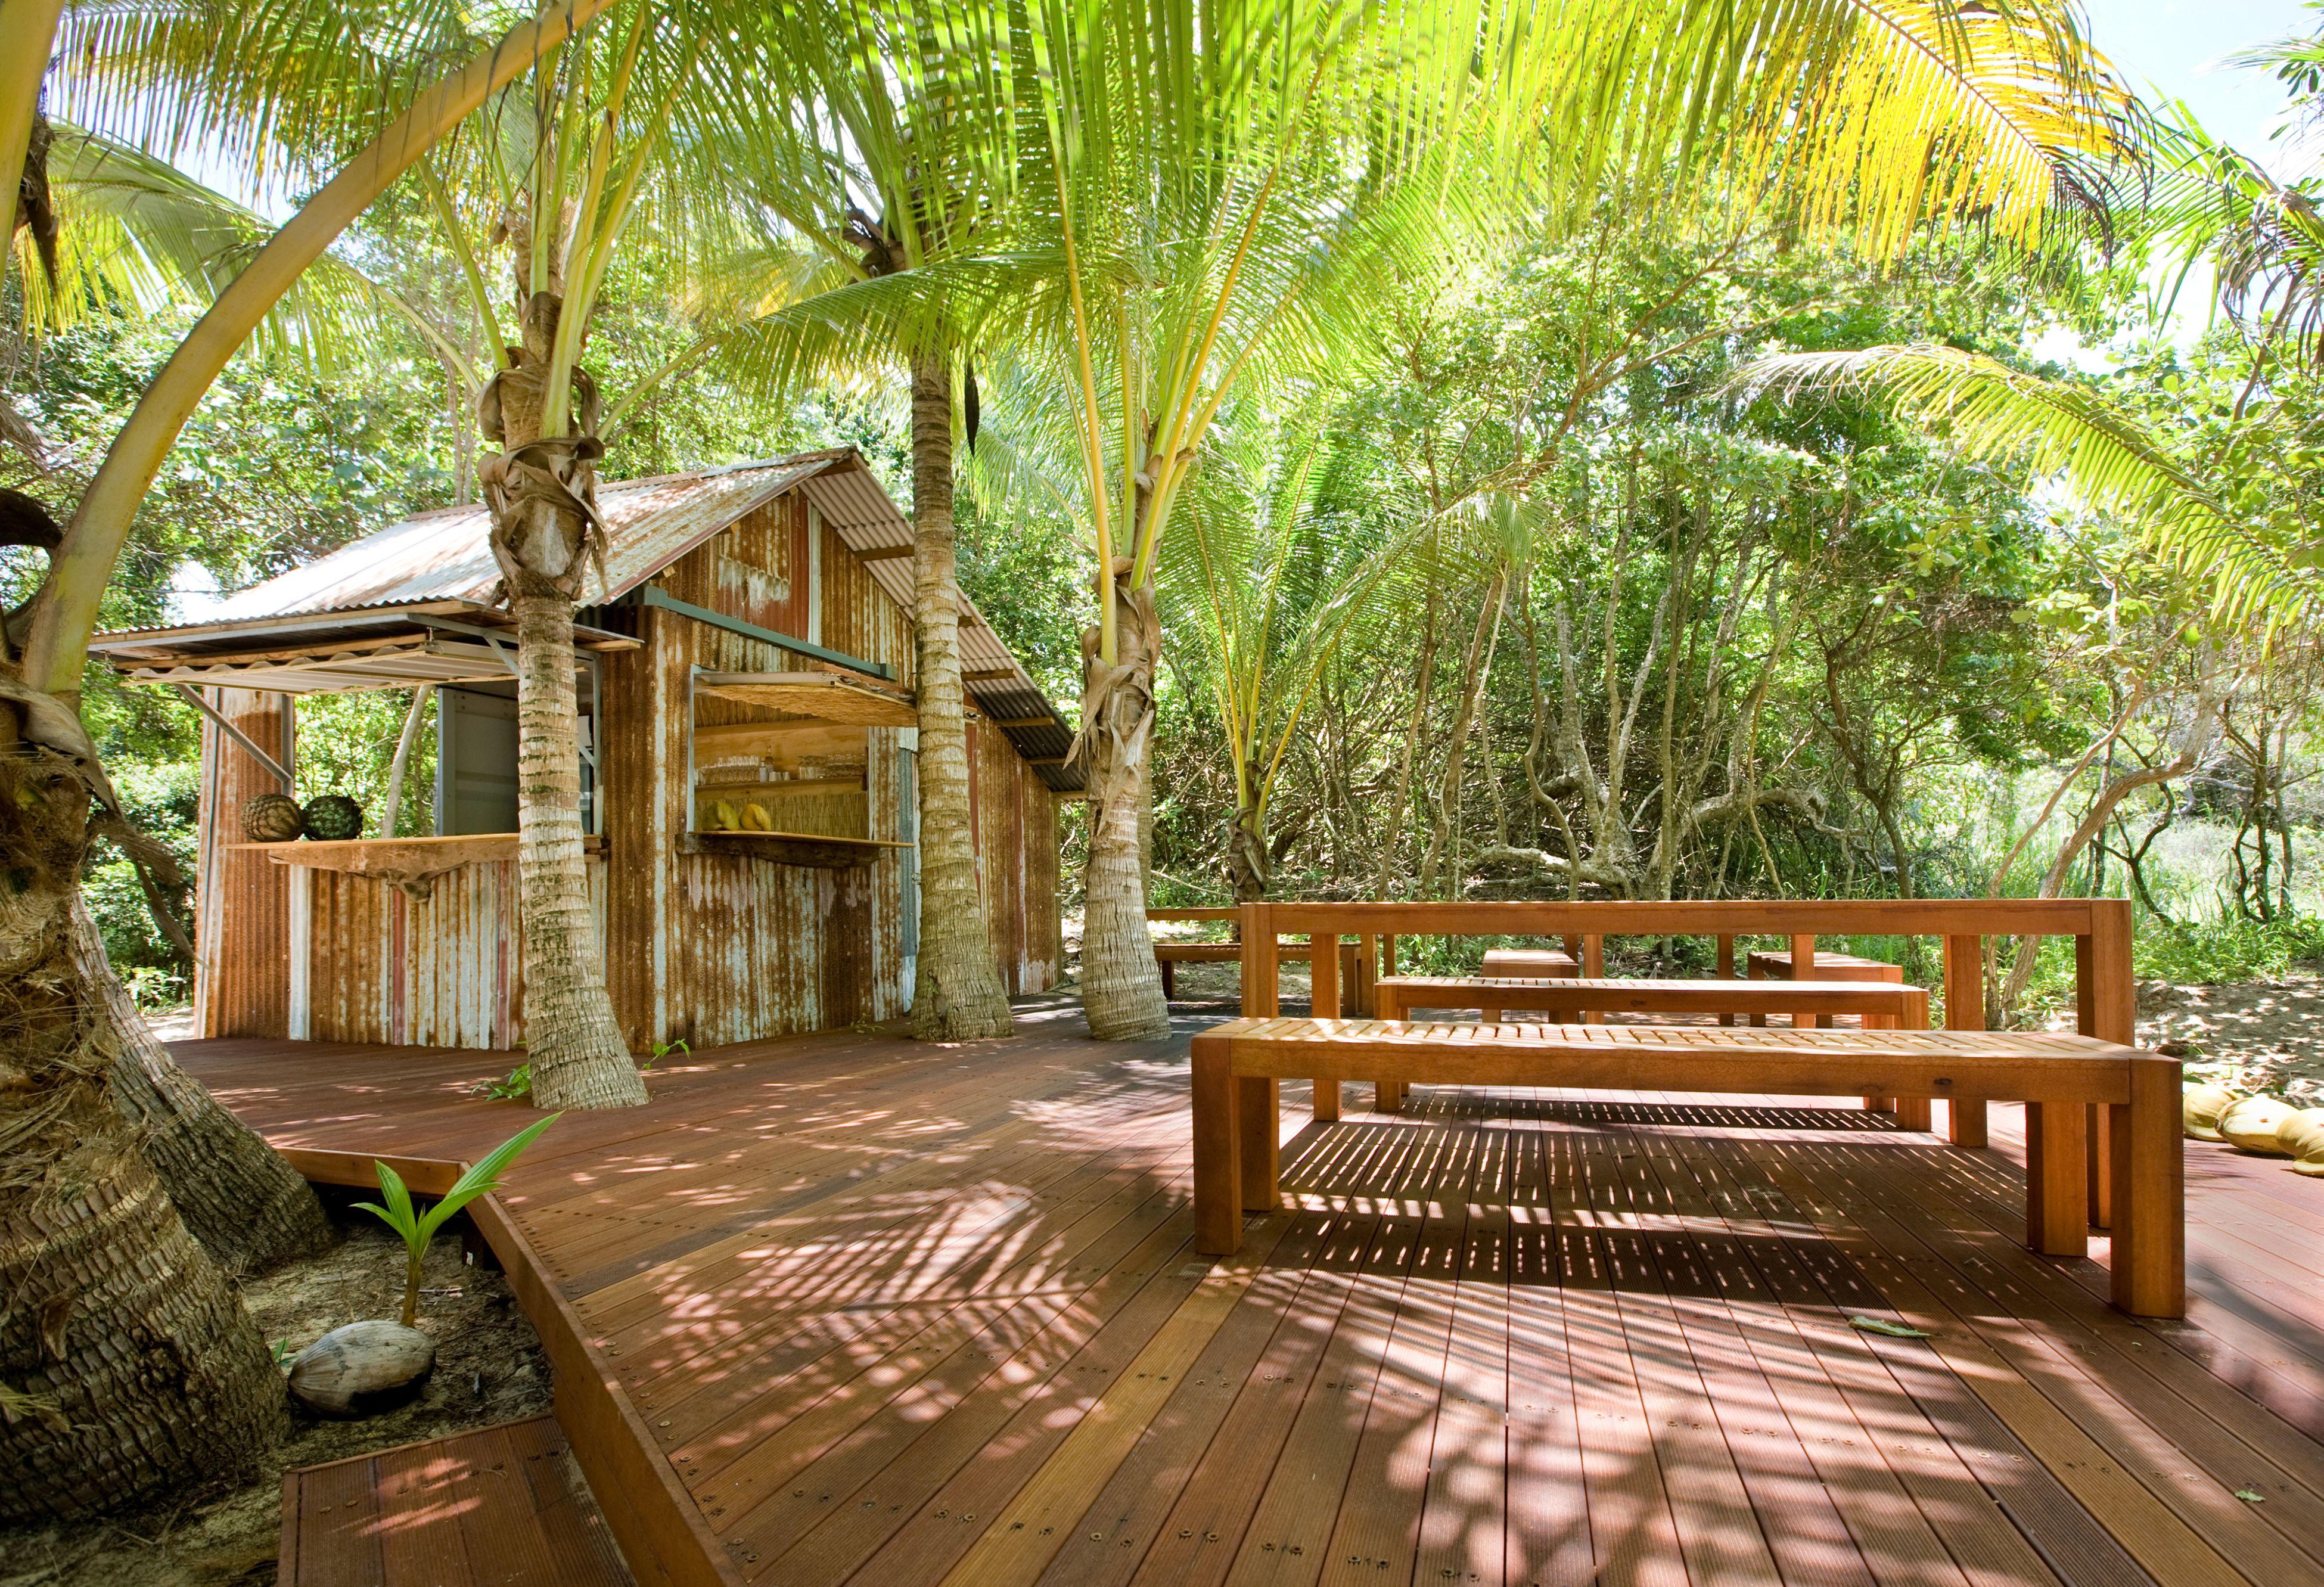 https://www.thalabeach.com.au/wp-content/uploads/2010/07/Herbies-Beach-Shack.jpg